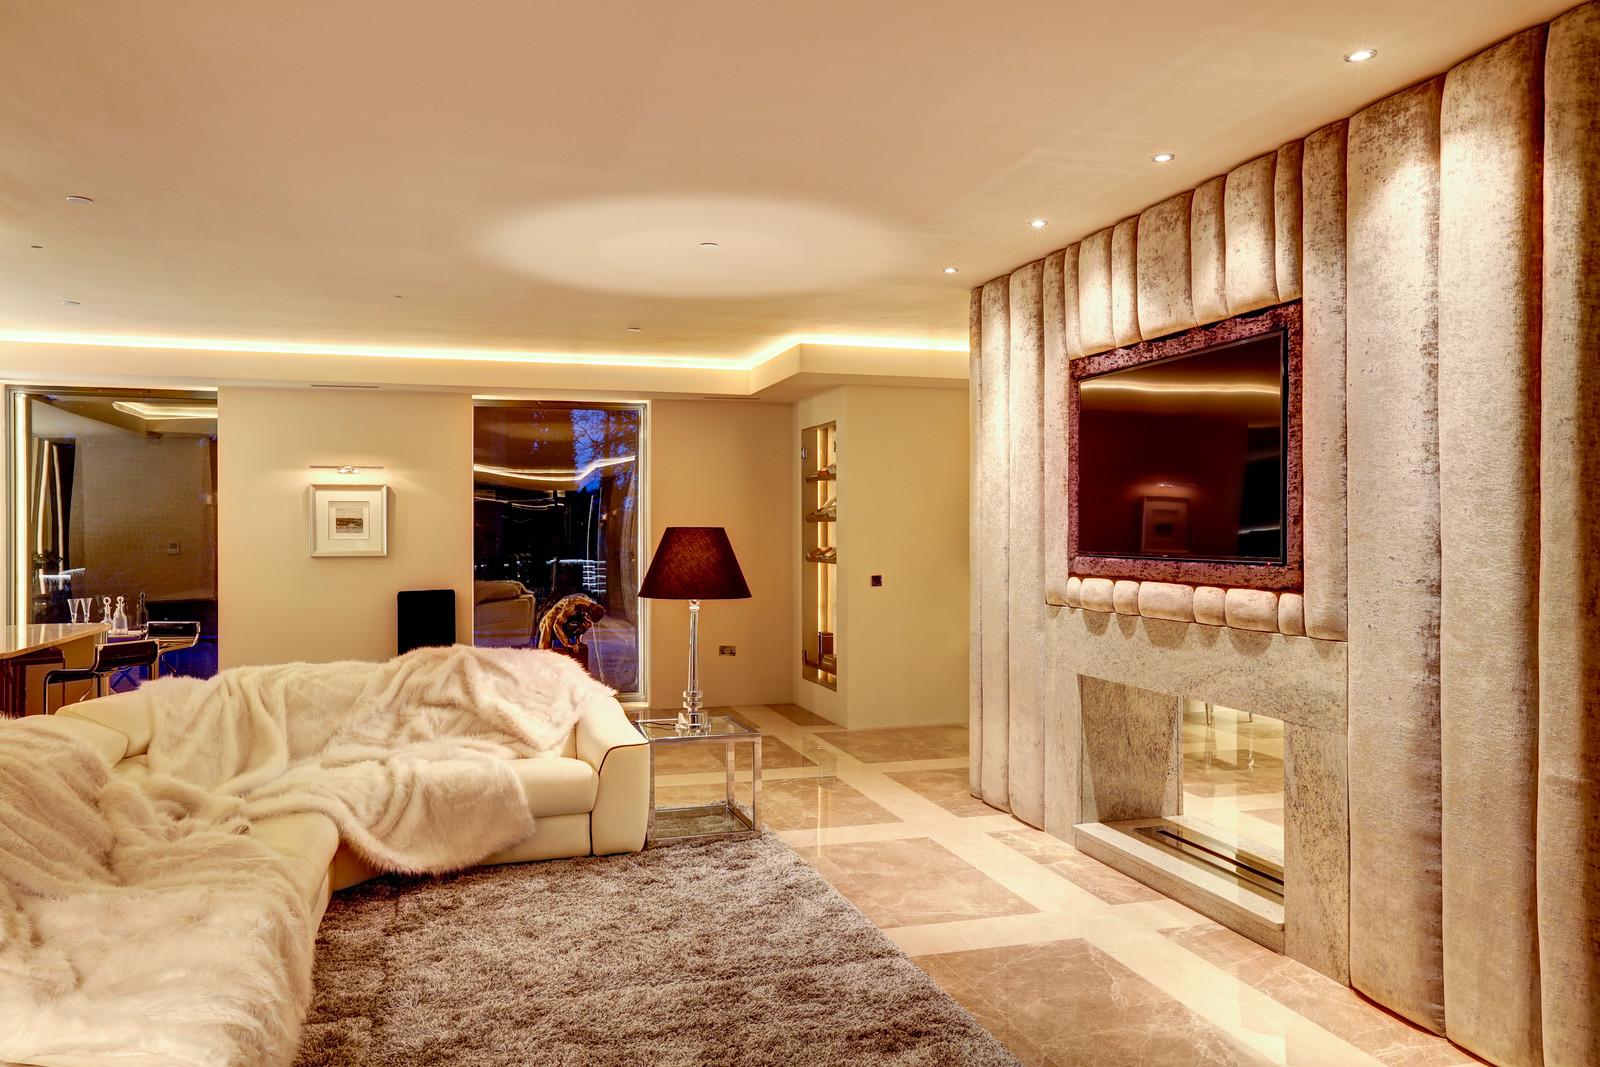 Luxurious living room, Tanglewood, Colston Bassett, Nottingham by Luxury Interiors specialists Guy Phoenix